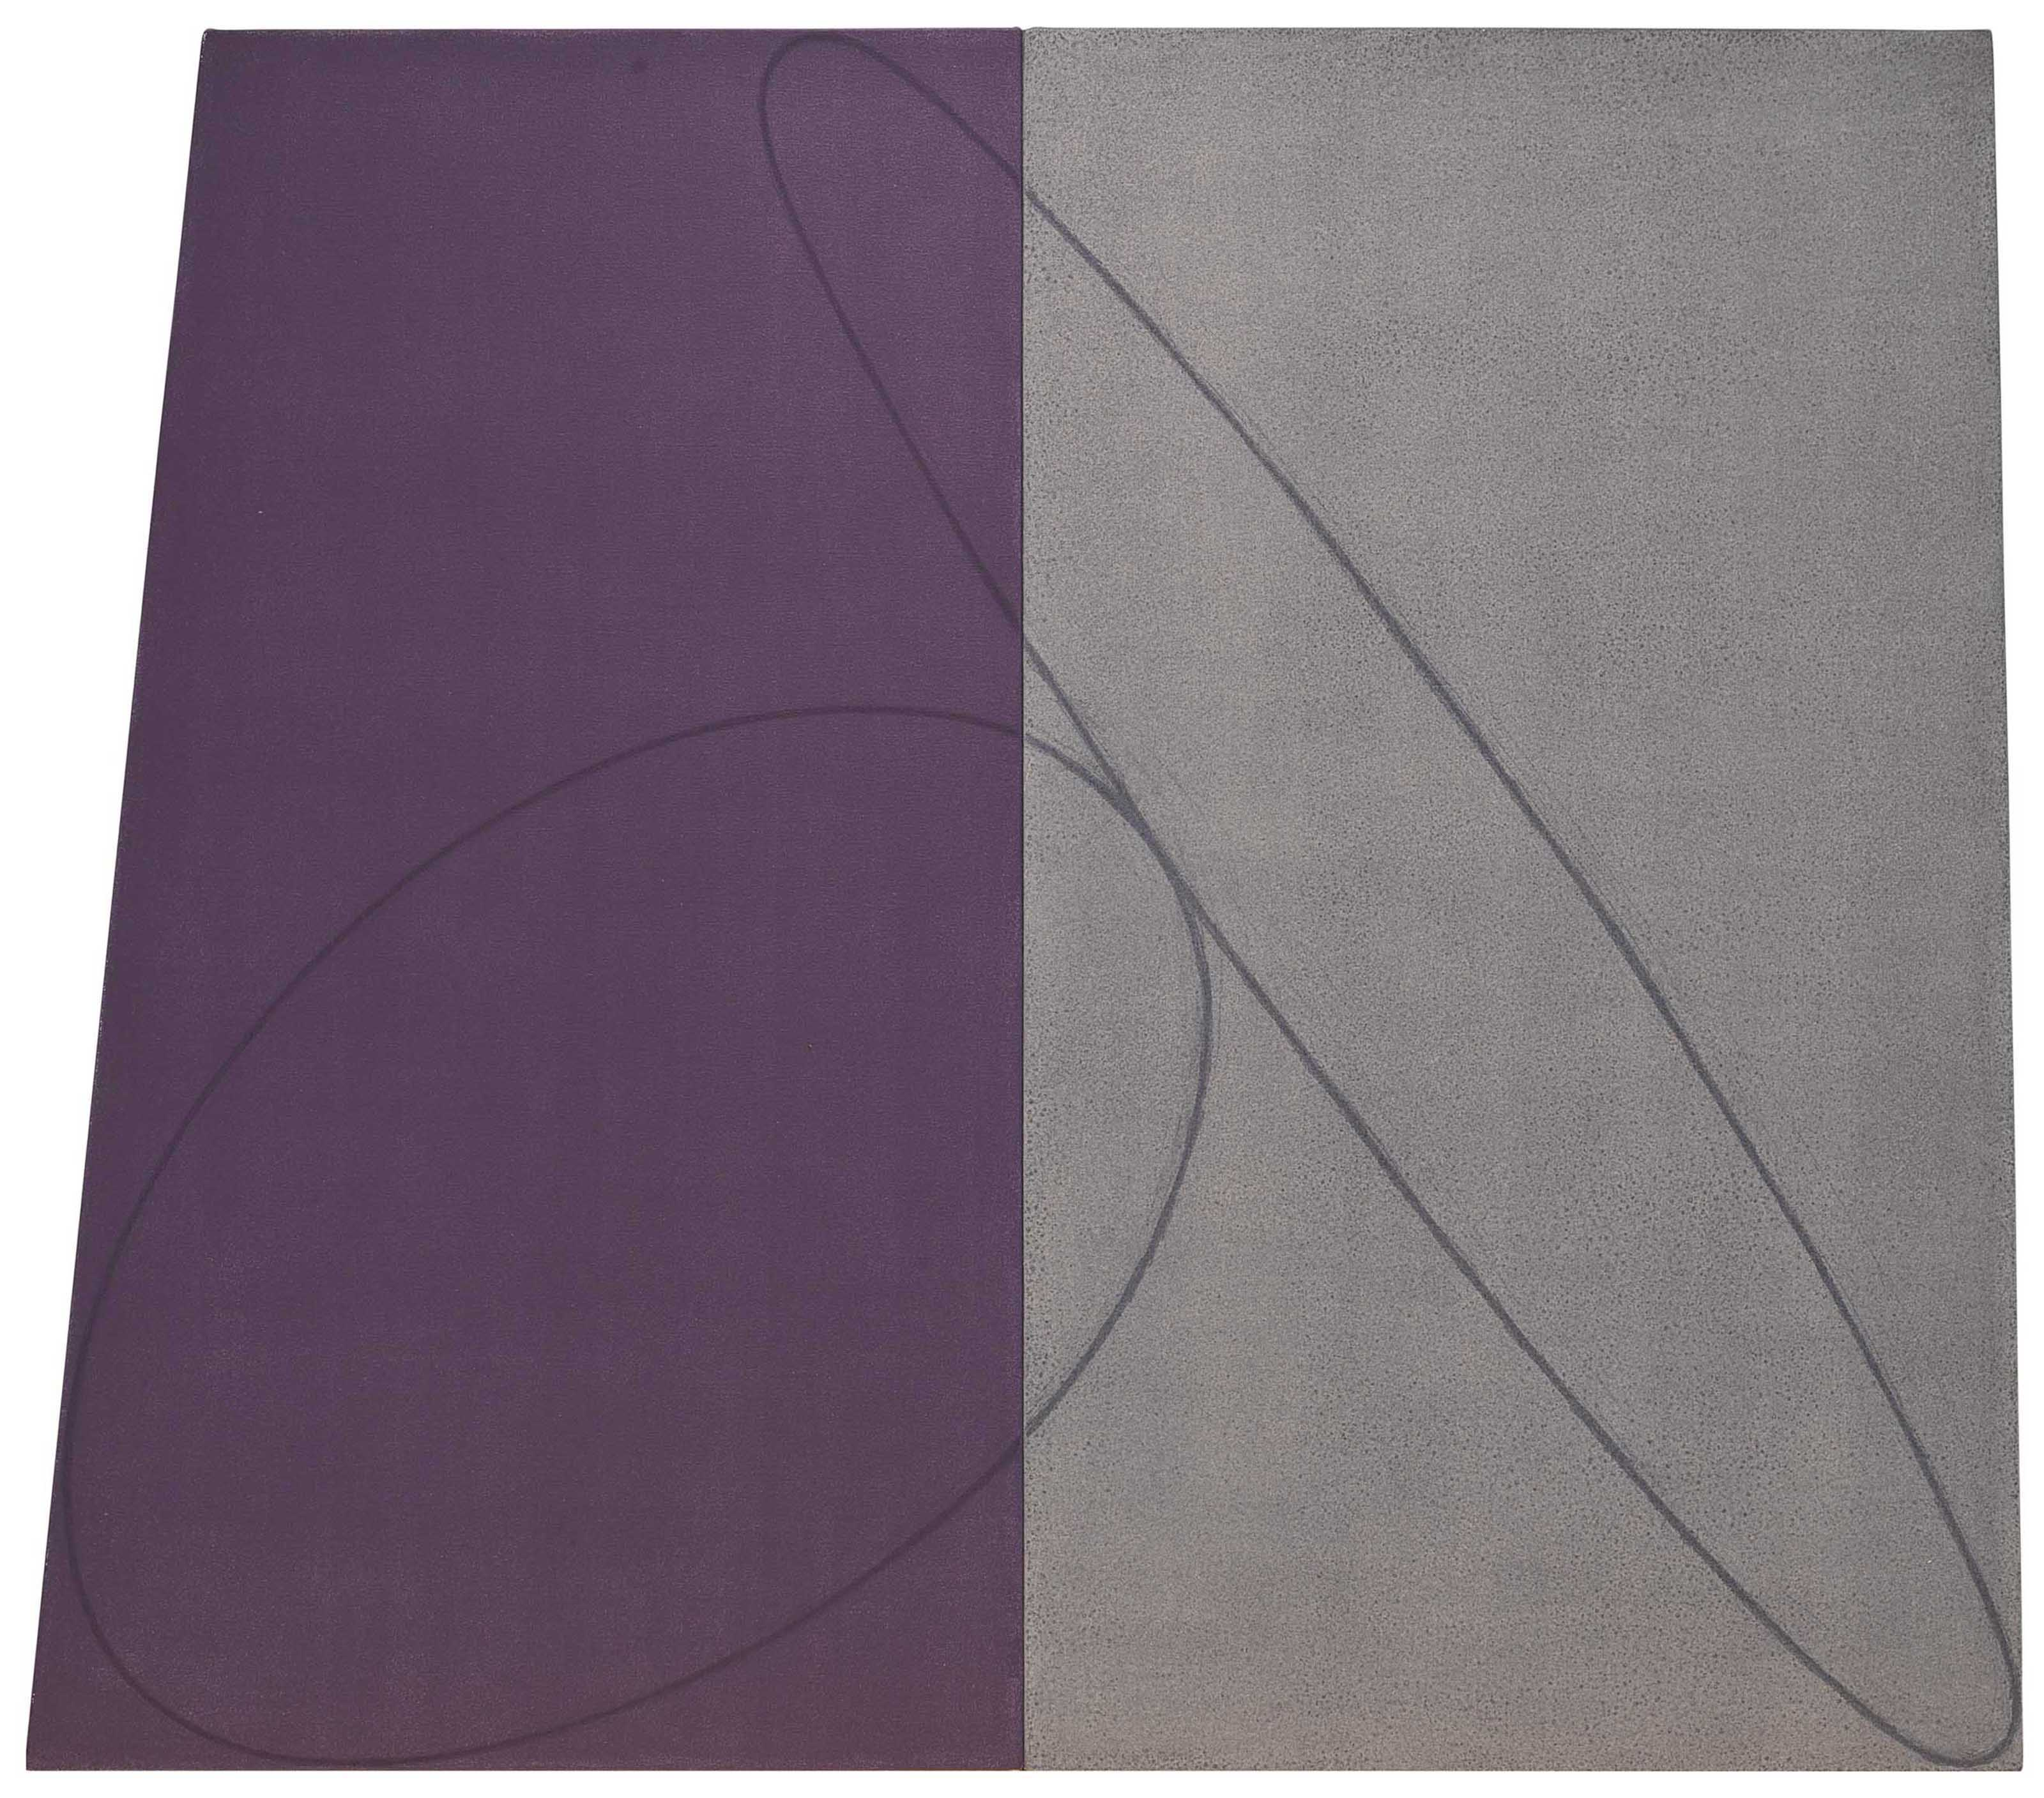 Plane/Figure Series G (Double Panel), Study